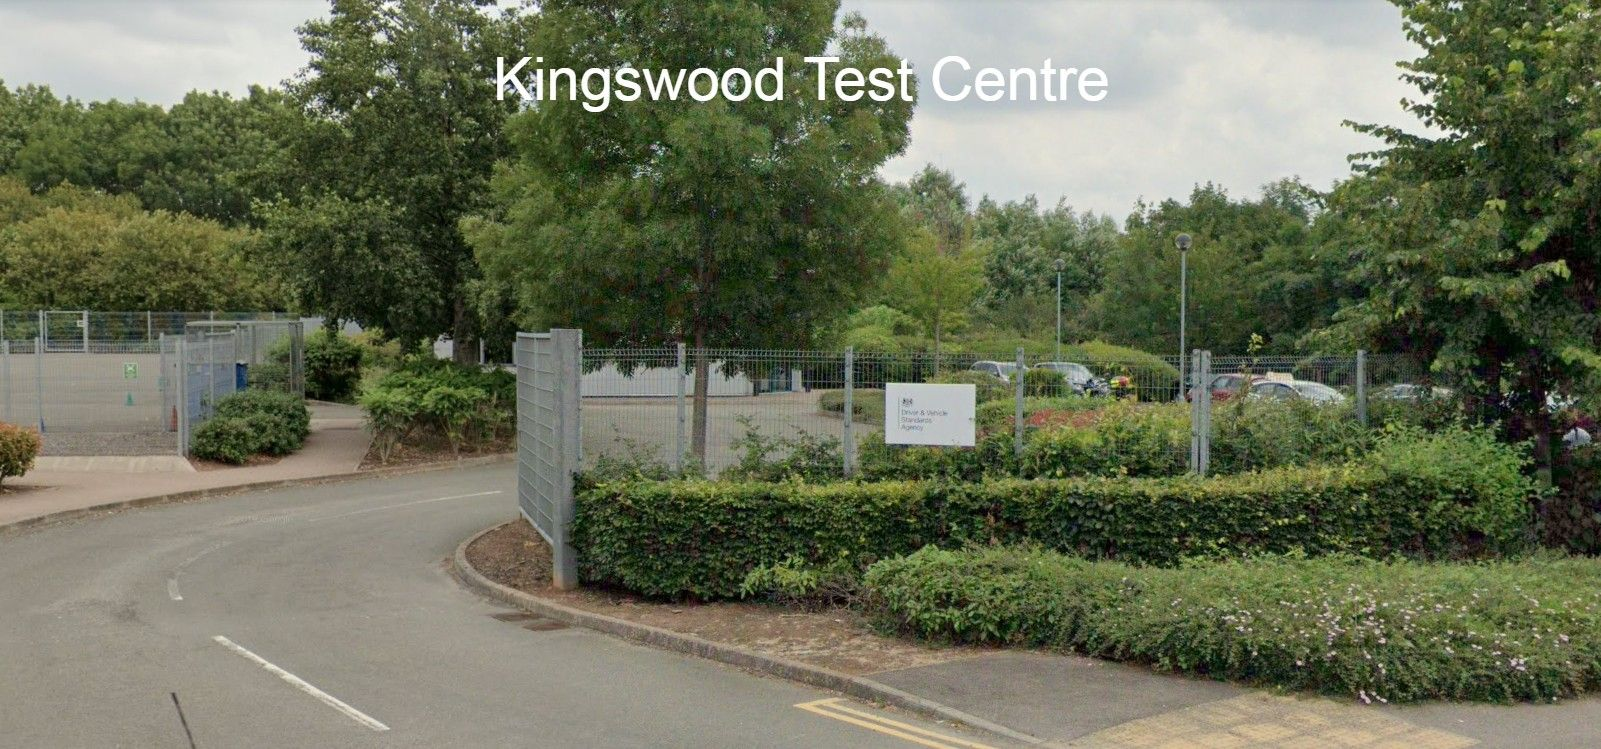 Kingswwod Driving Test Centre